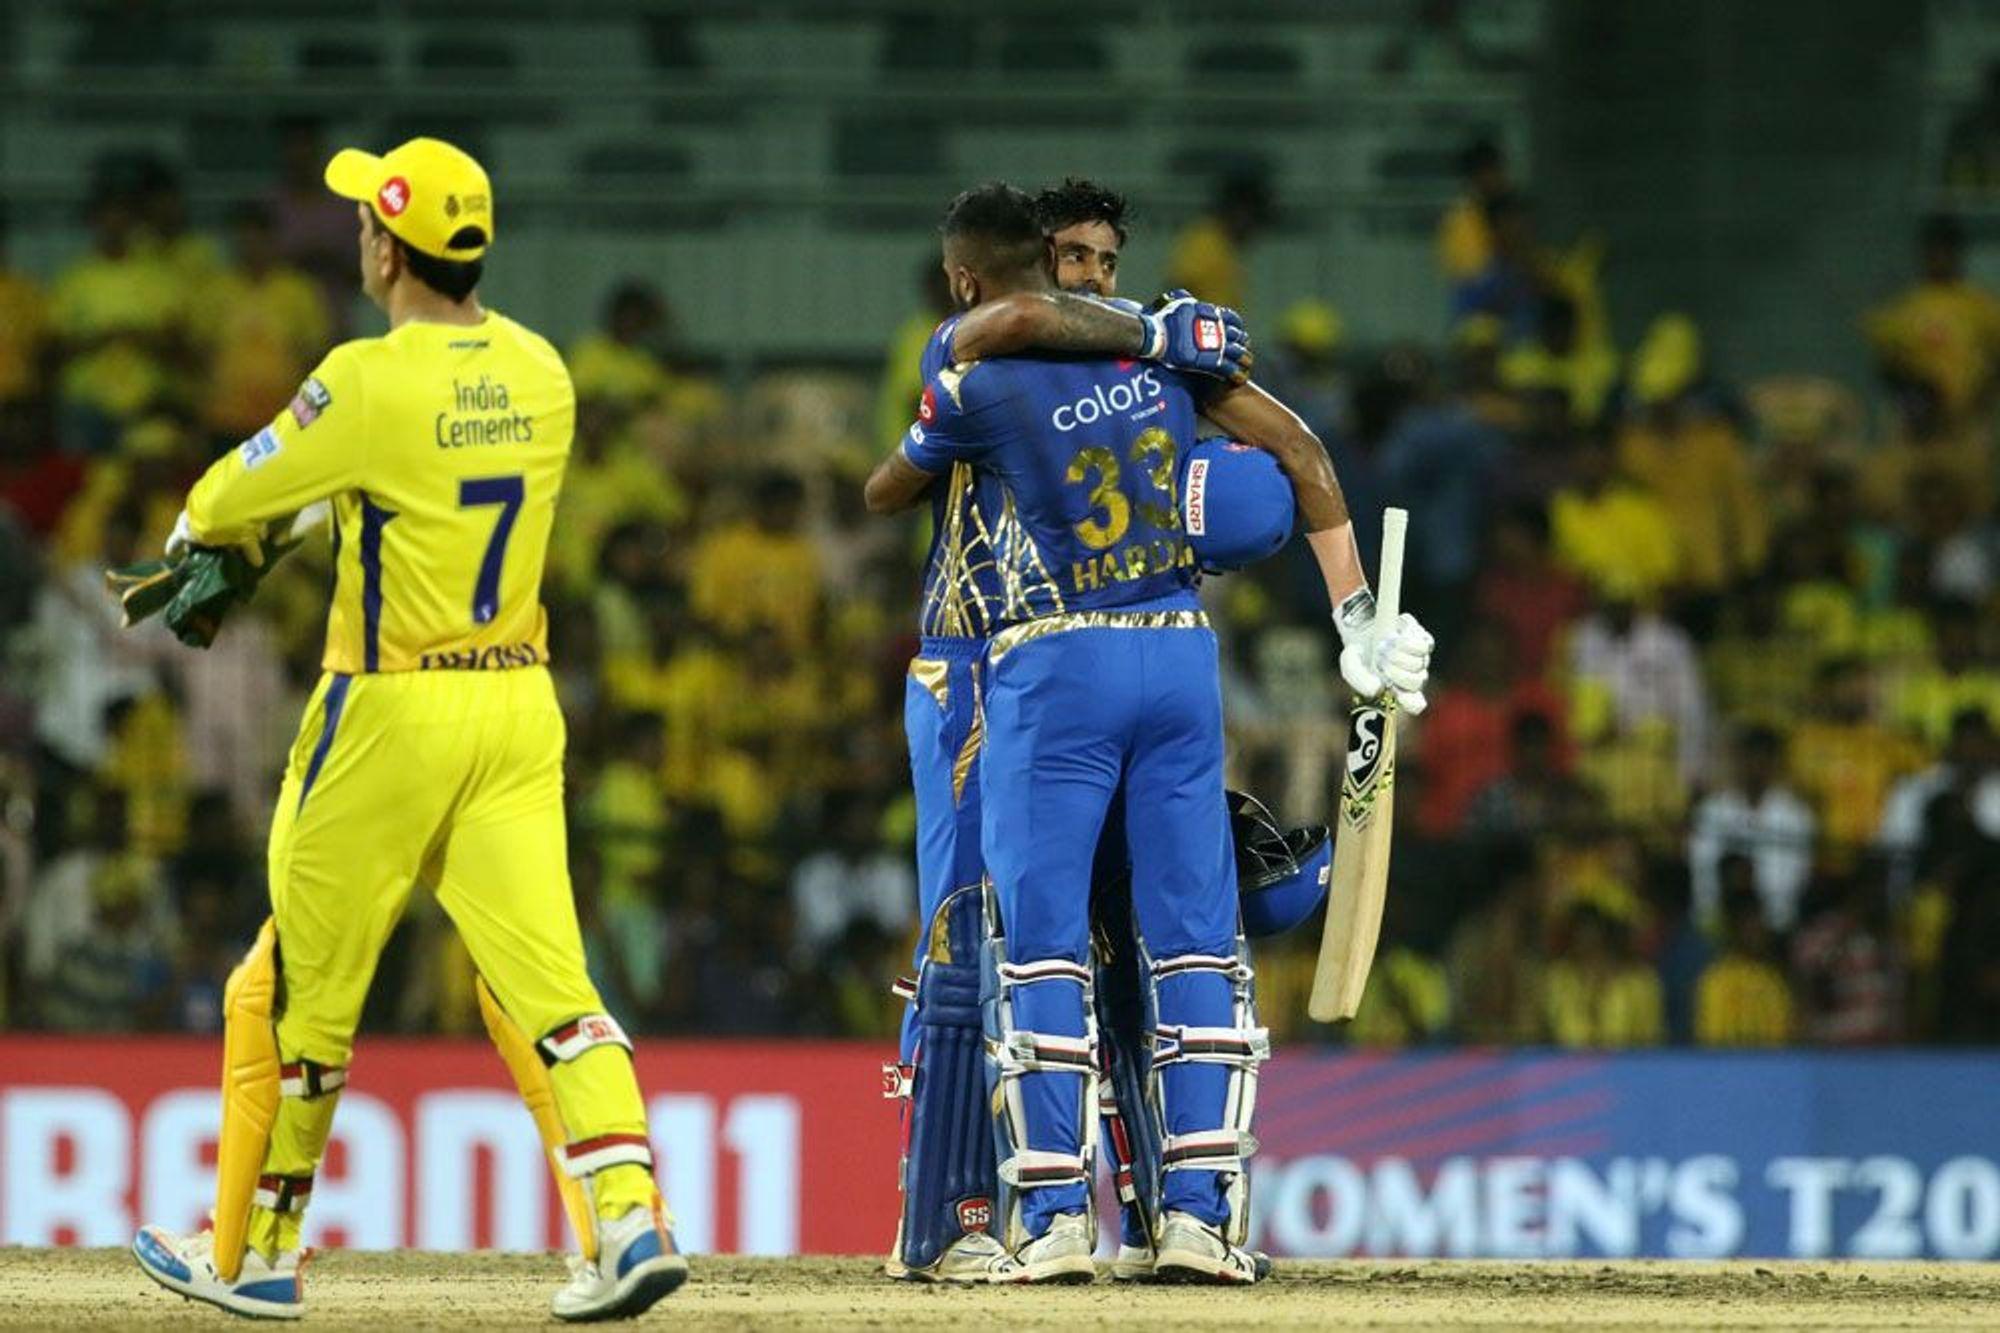 Mumbai Indians, Chennai Super Kings, IPL, MI, CSK, Sports, IPL, 2019, NewsMobile, Mobile, News, India, Cricket